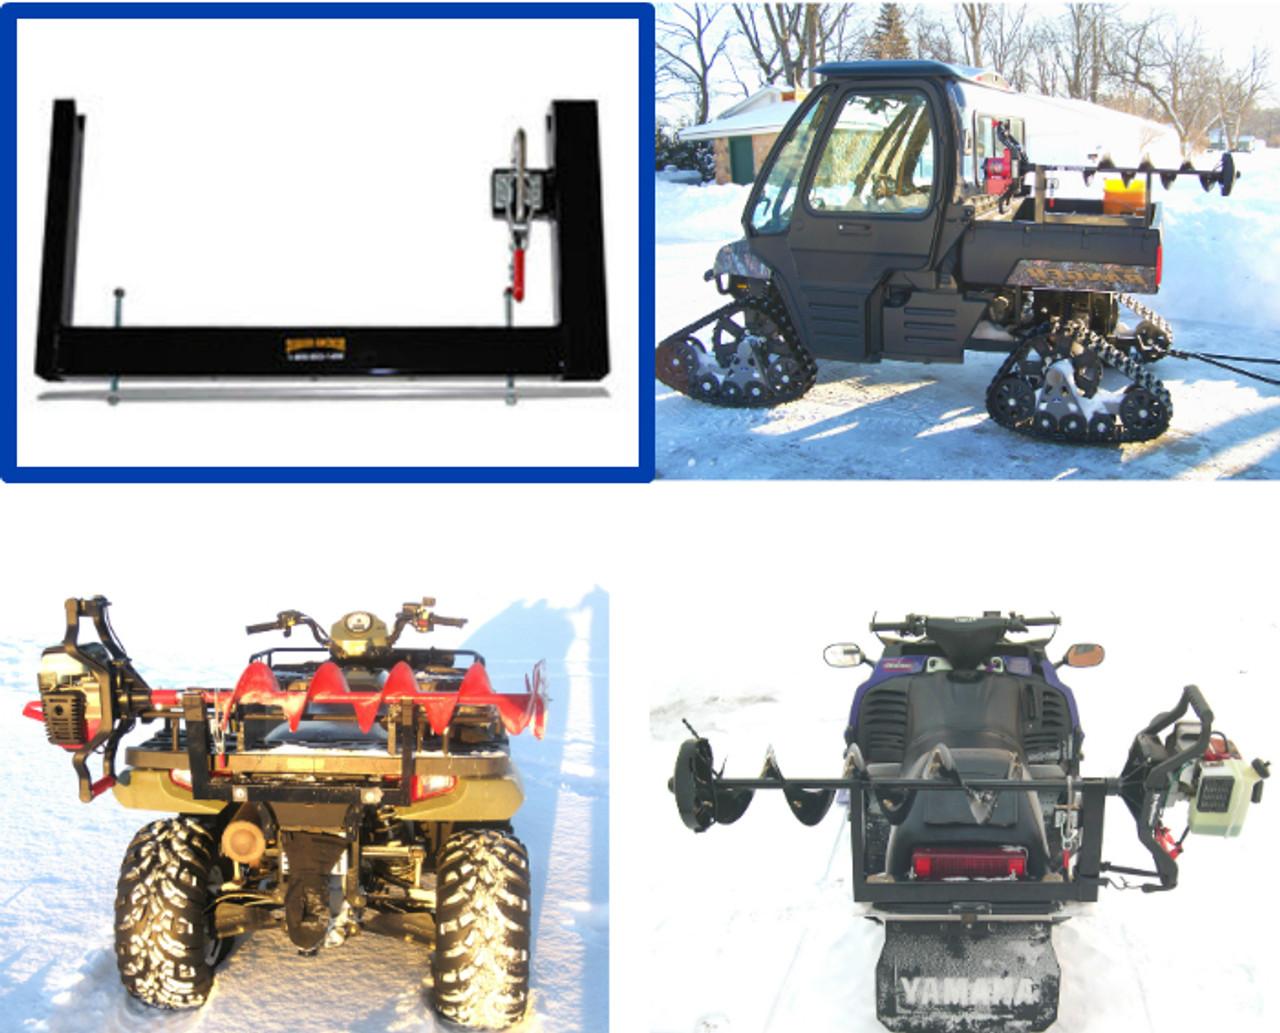 Digger anchor ice auger mount rack carrier fourwheeler utv snowmobile